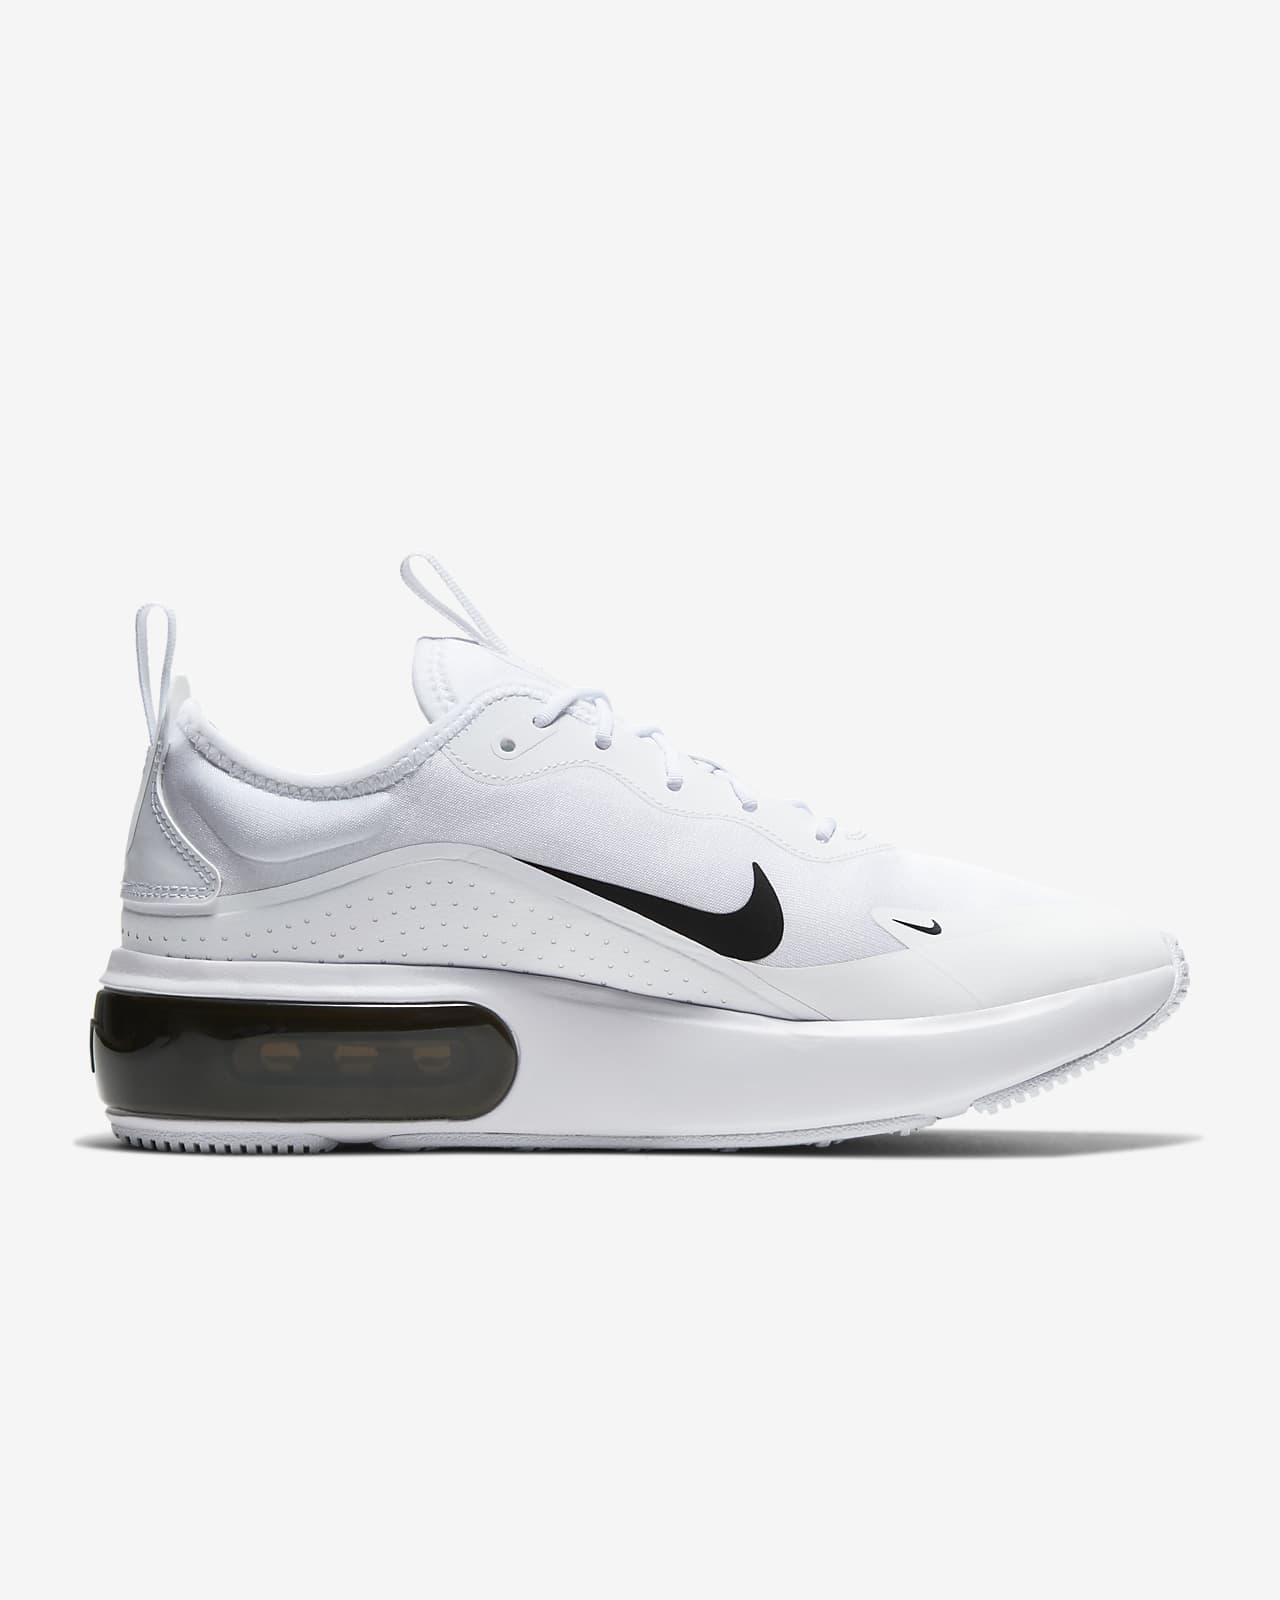 Nike Air Max Dia Women's Shoe. Nike LU